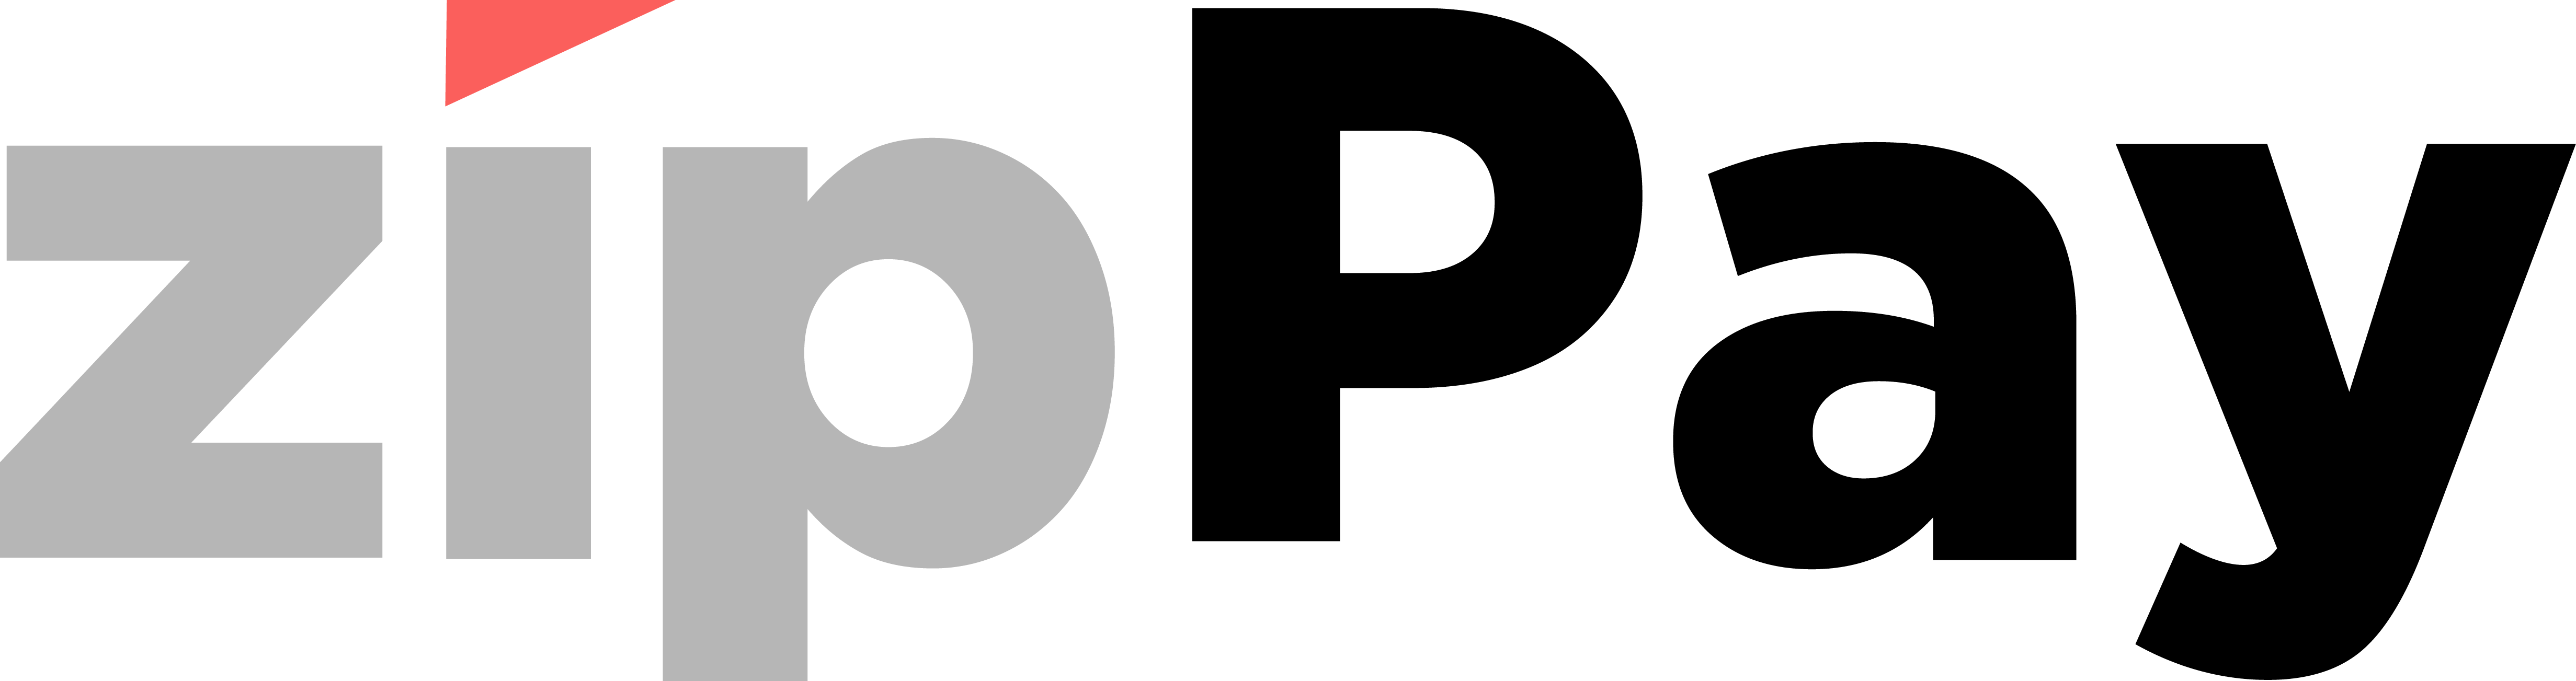 zipPay-Logo-Grayscale